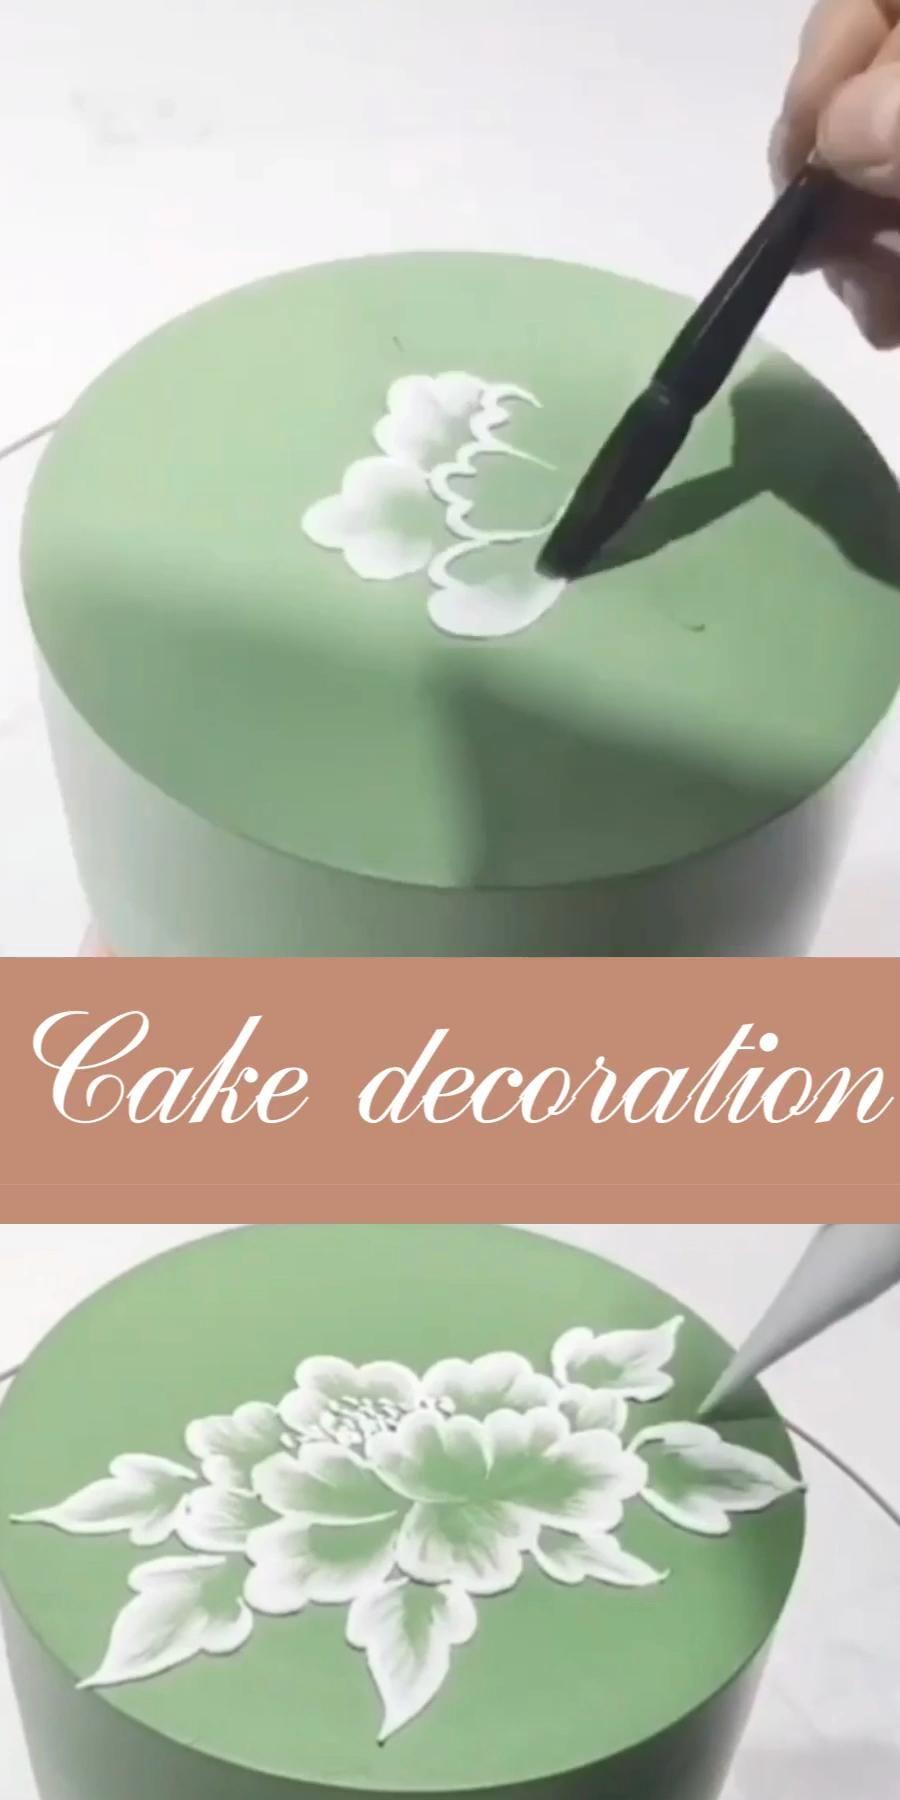 90pcs Lot Cake Decorating Tools